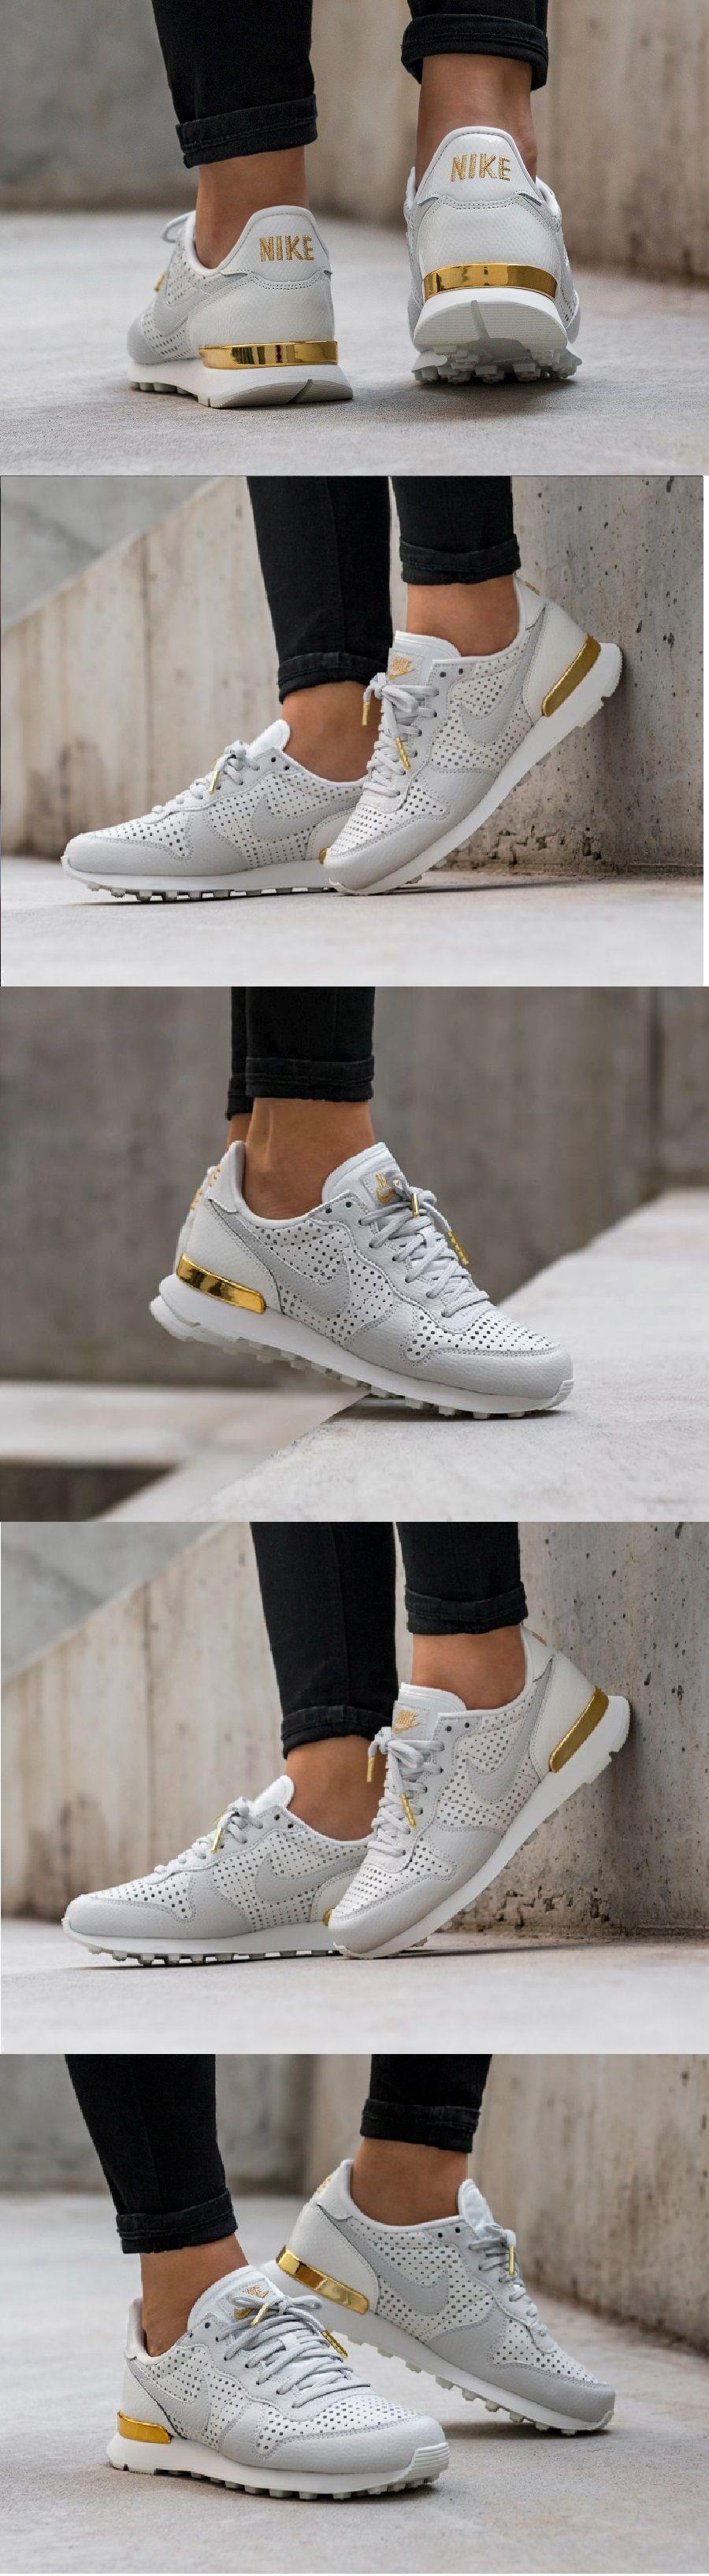 on sale 94ae3 cd79c  Nike  Internationalist  Premium  White  Metallic  Gold